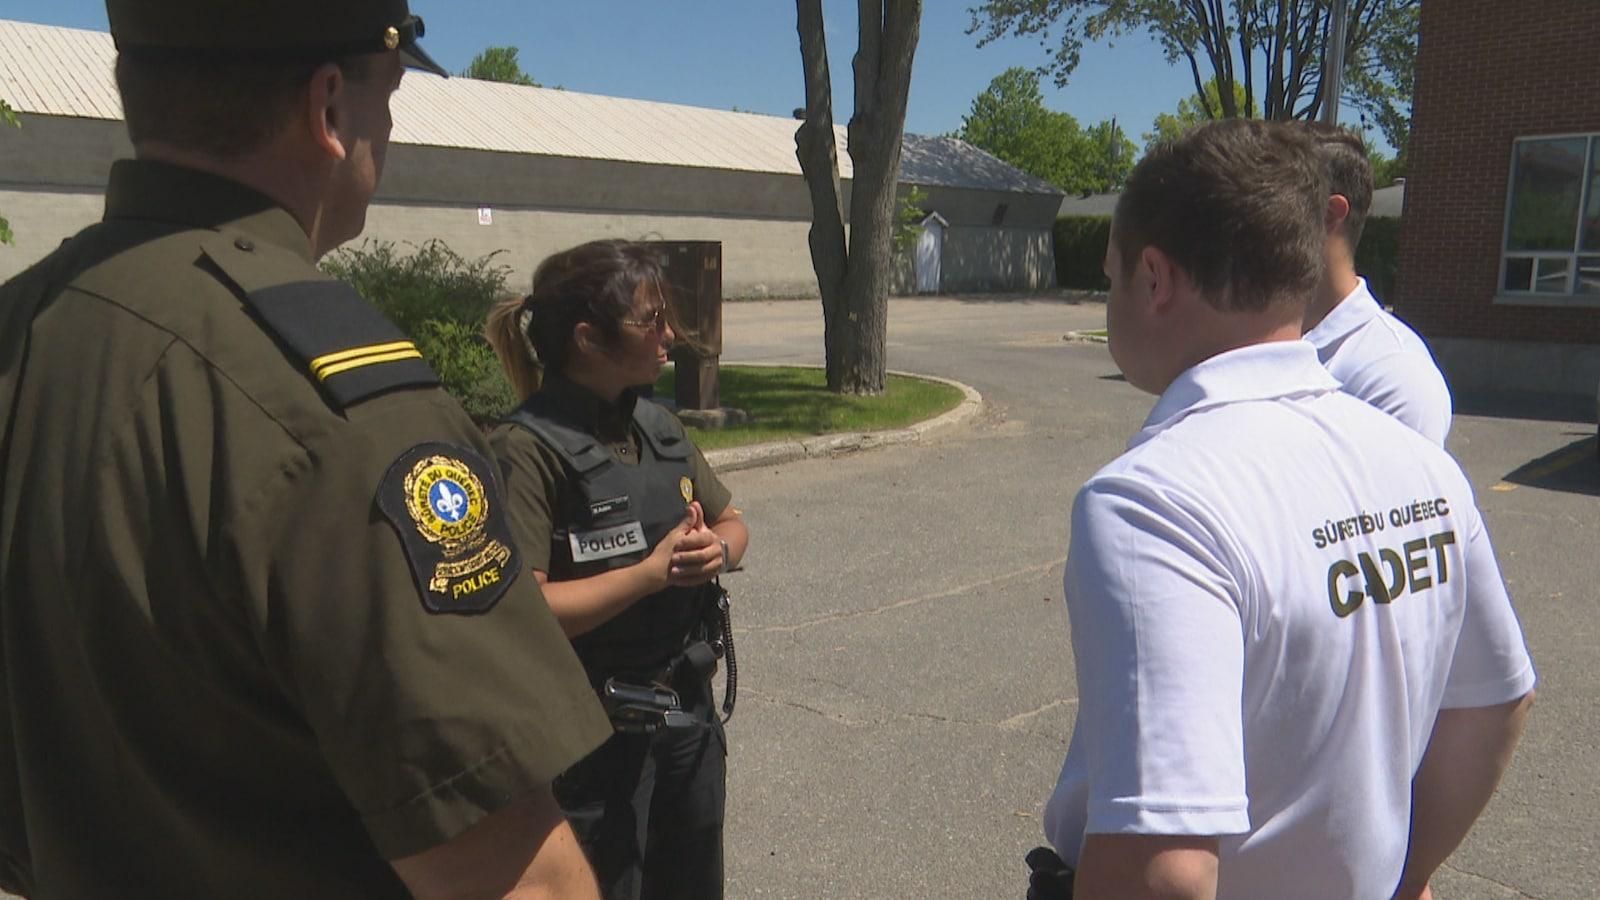 Des cadets et des policiers de la SQ discutent.